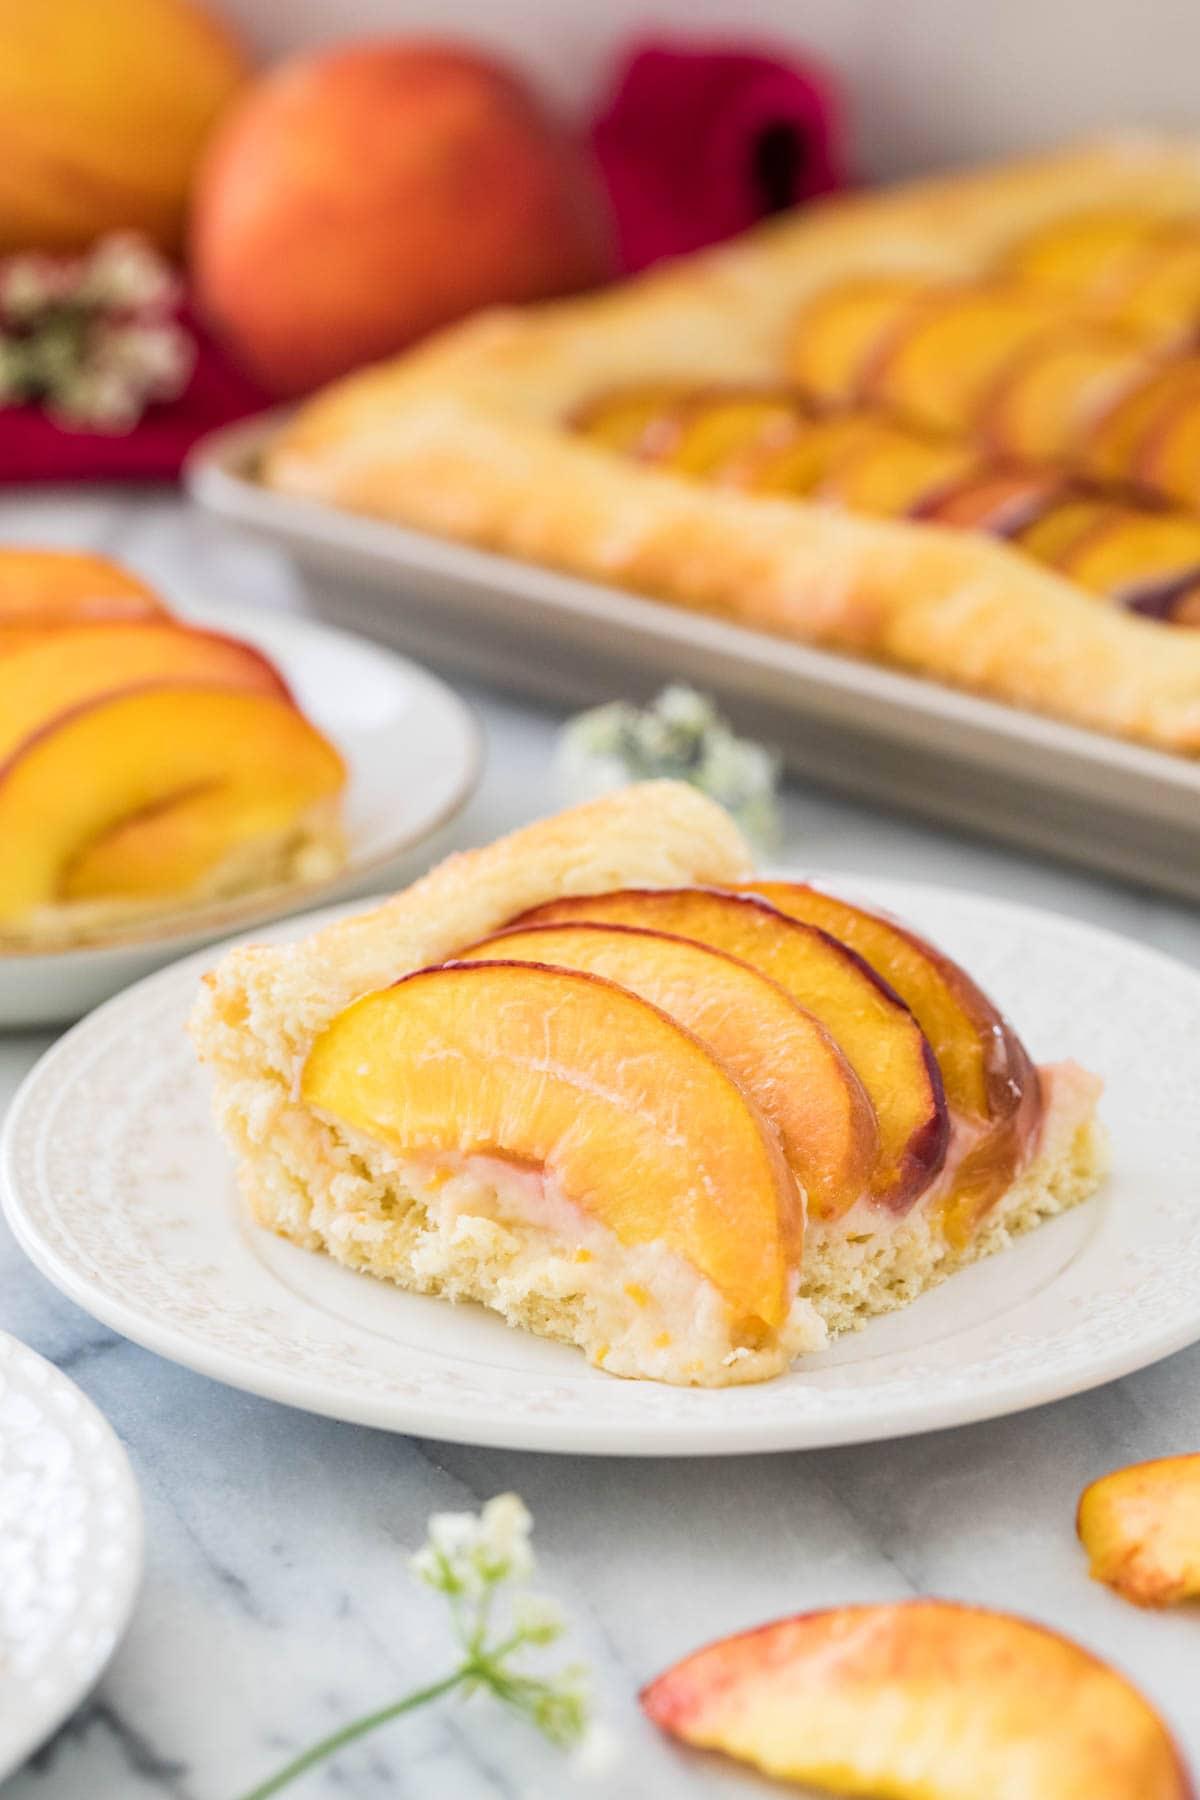 Slice of fresh peach cake on white plate